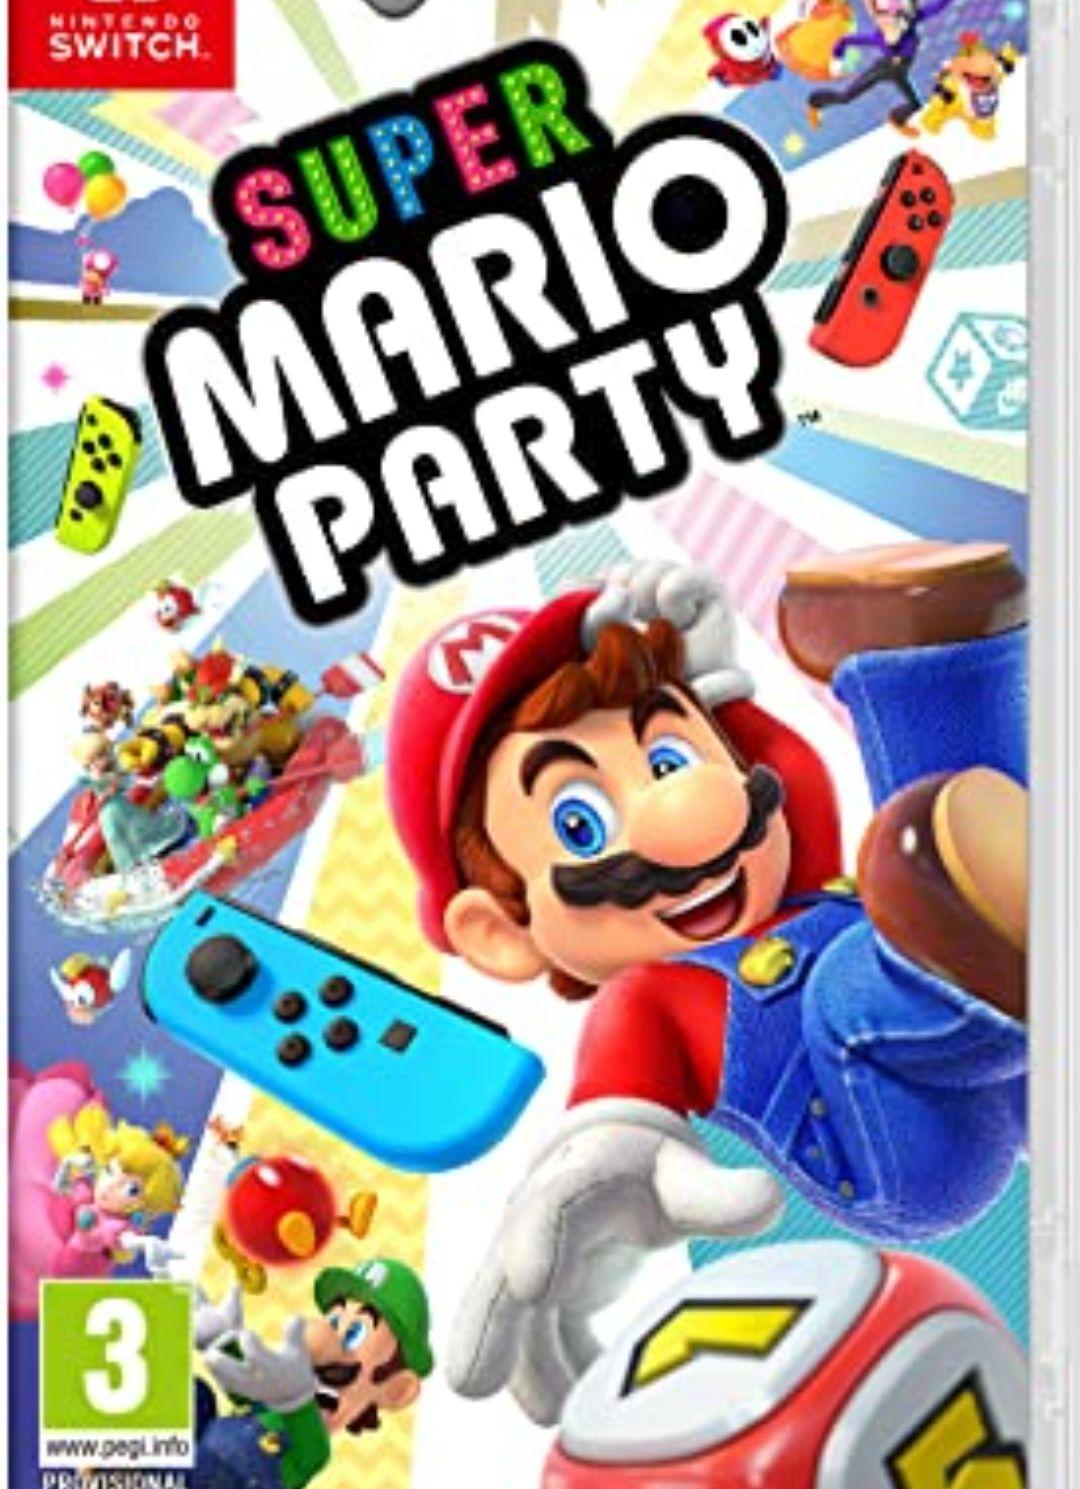 Mario party para nintendo switch por 42€ en Amazon